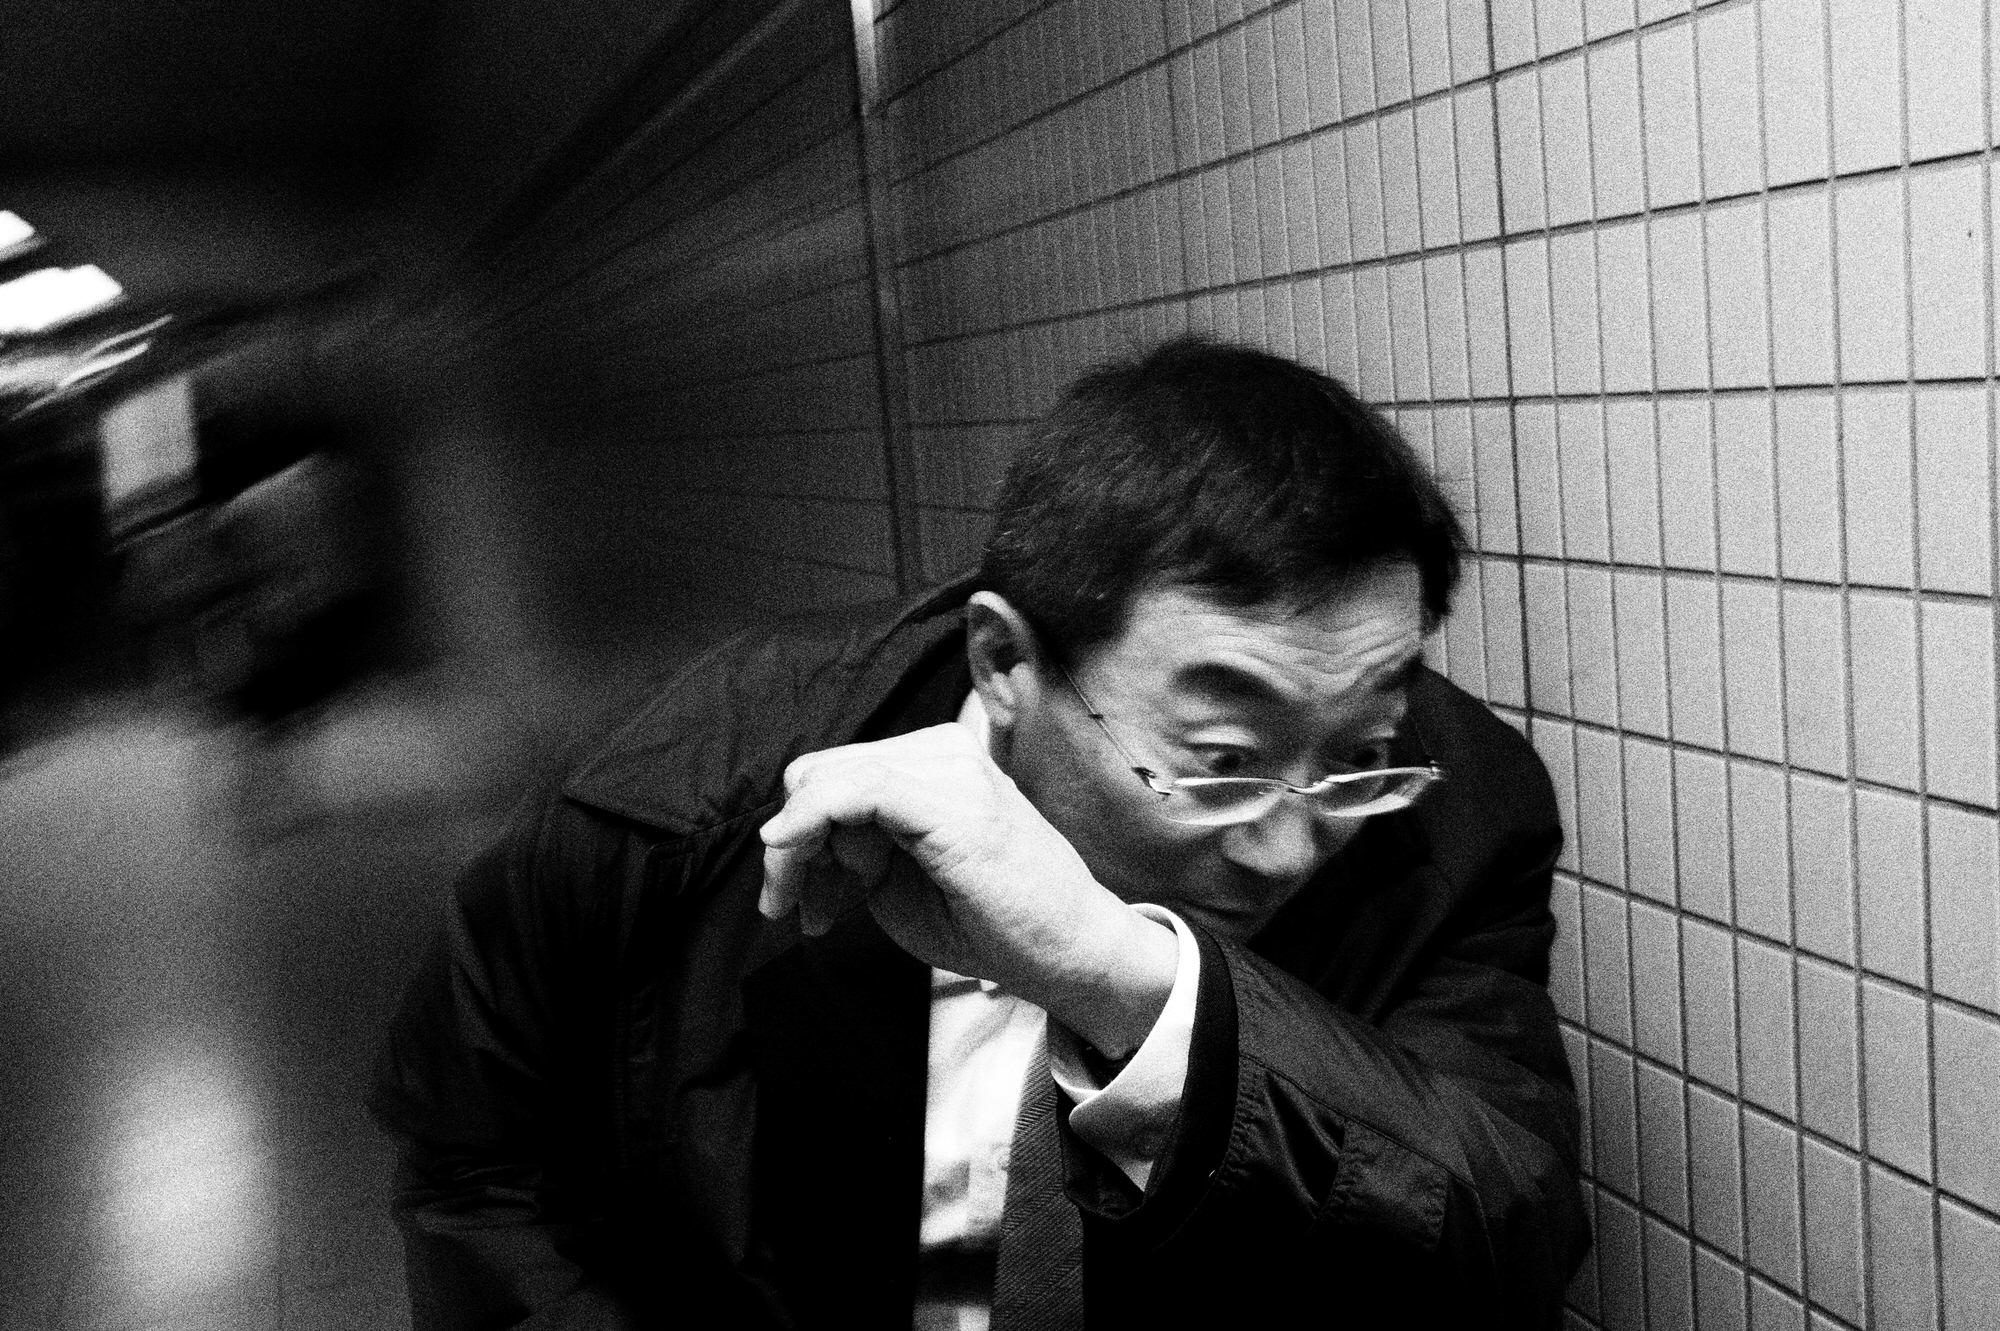 dark-skies-over-tokyo-dodge-leica-m9-2012eric kim street photograpy - black and white - Monochrome-5.jpg